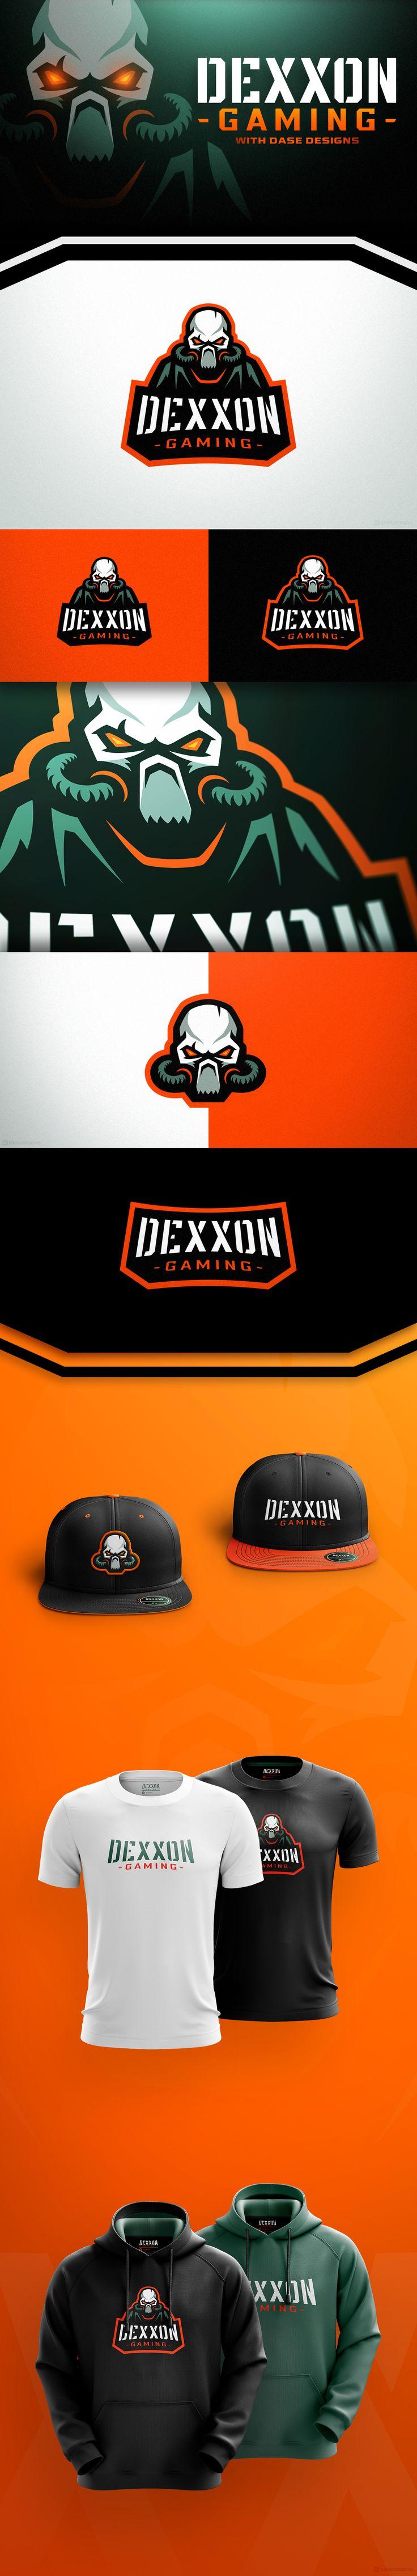 Gas Mask Logo Dexxon Gaming on Behance